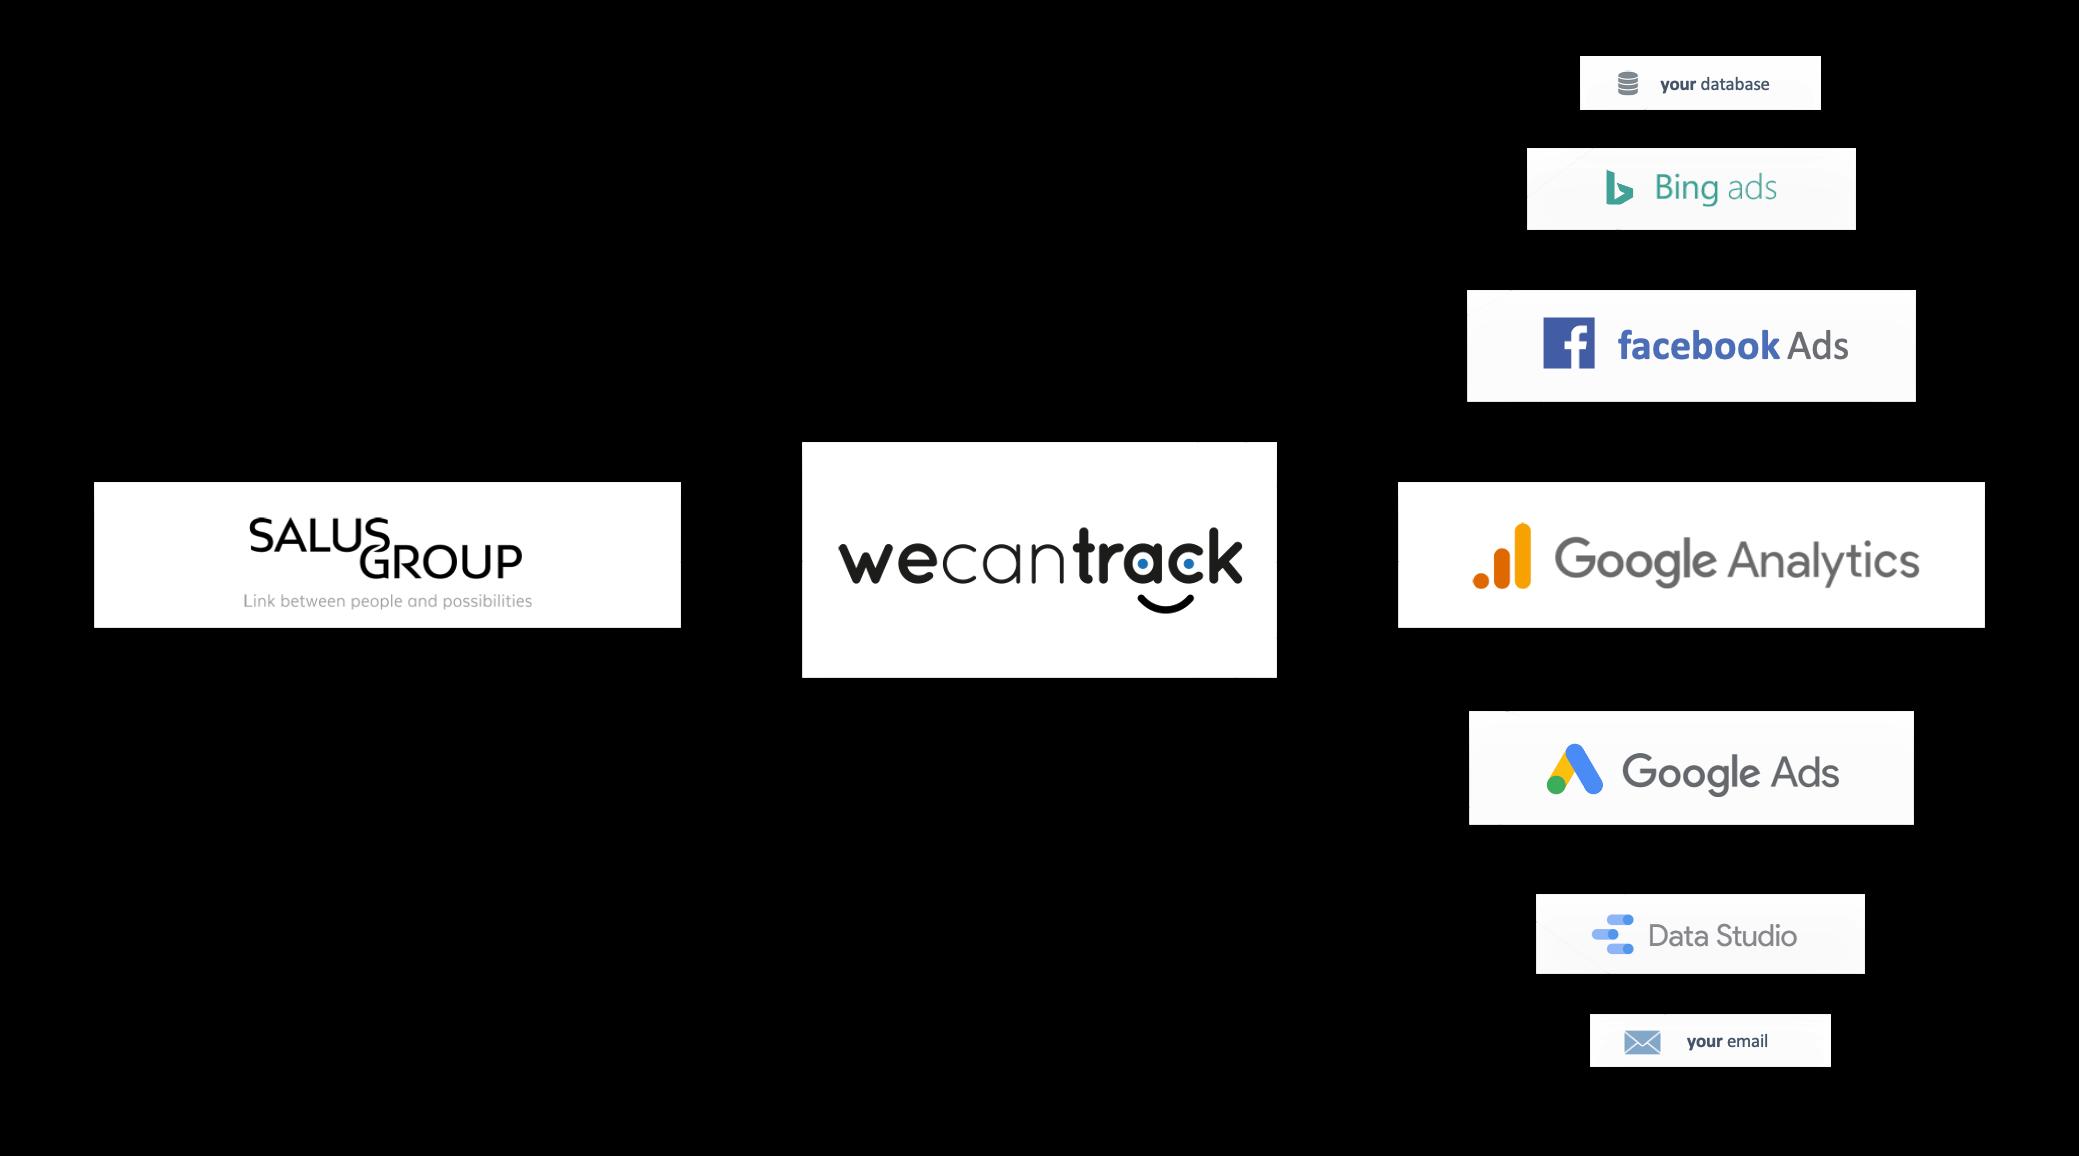 integrate-salus-affiliate-conversions-via-postback